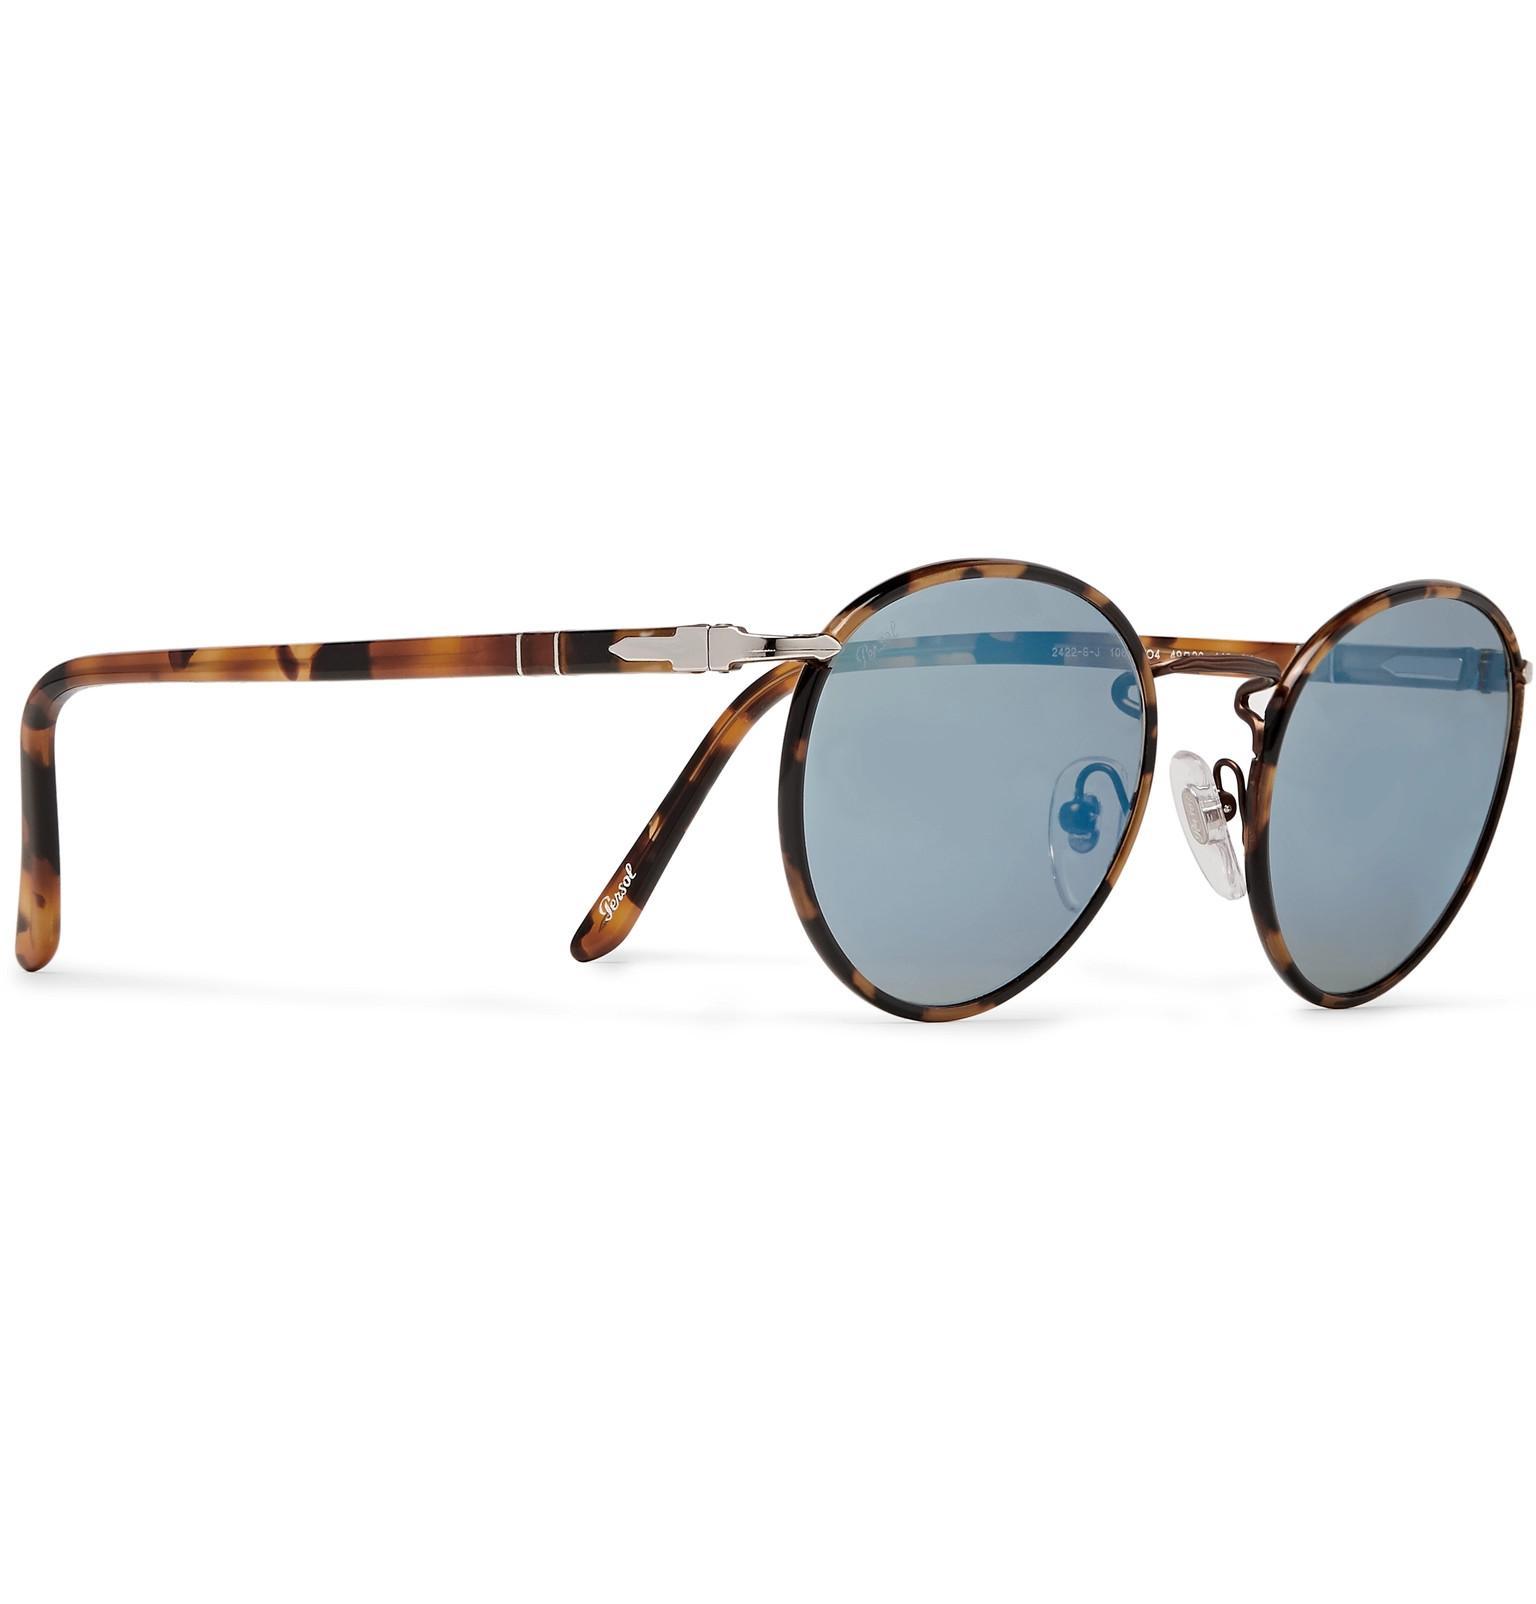 4e05e3dc6d99 Persol Round-frame Tortoiseshell Acetate Mirrored Sunglasses for Men ...